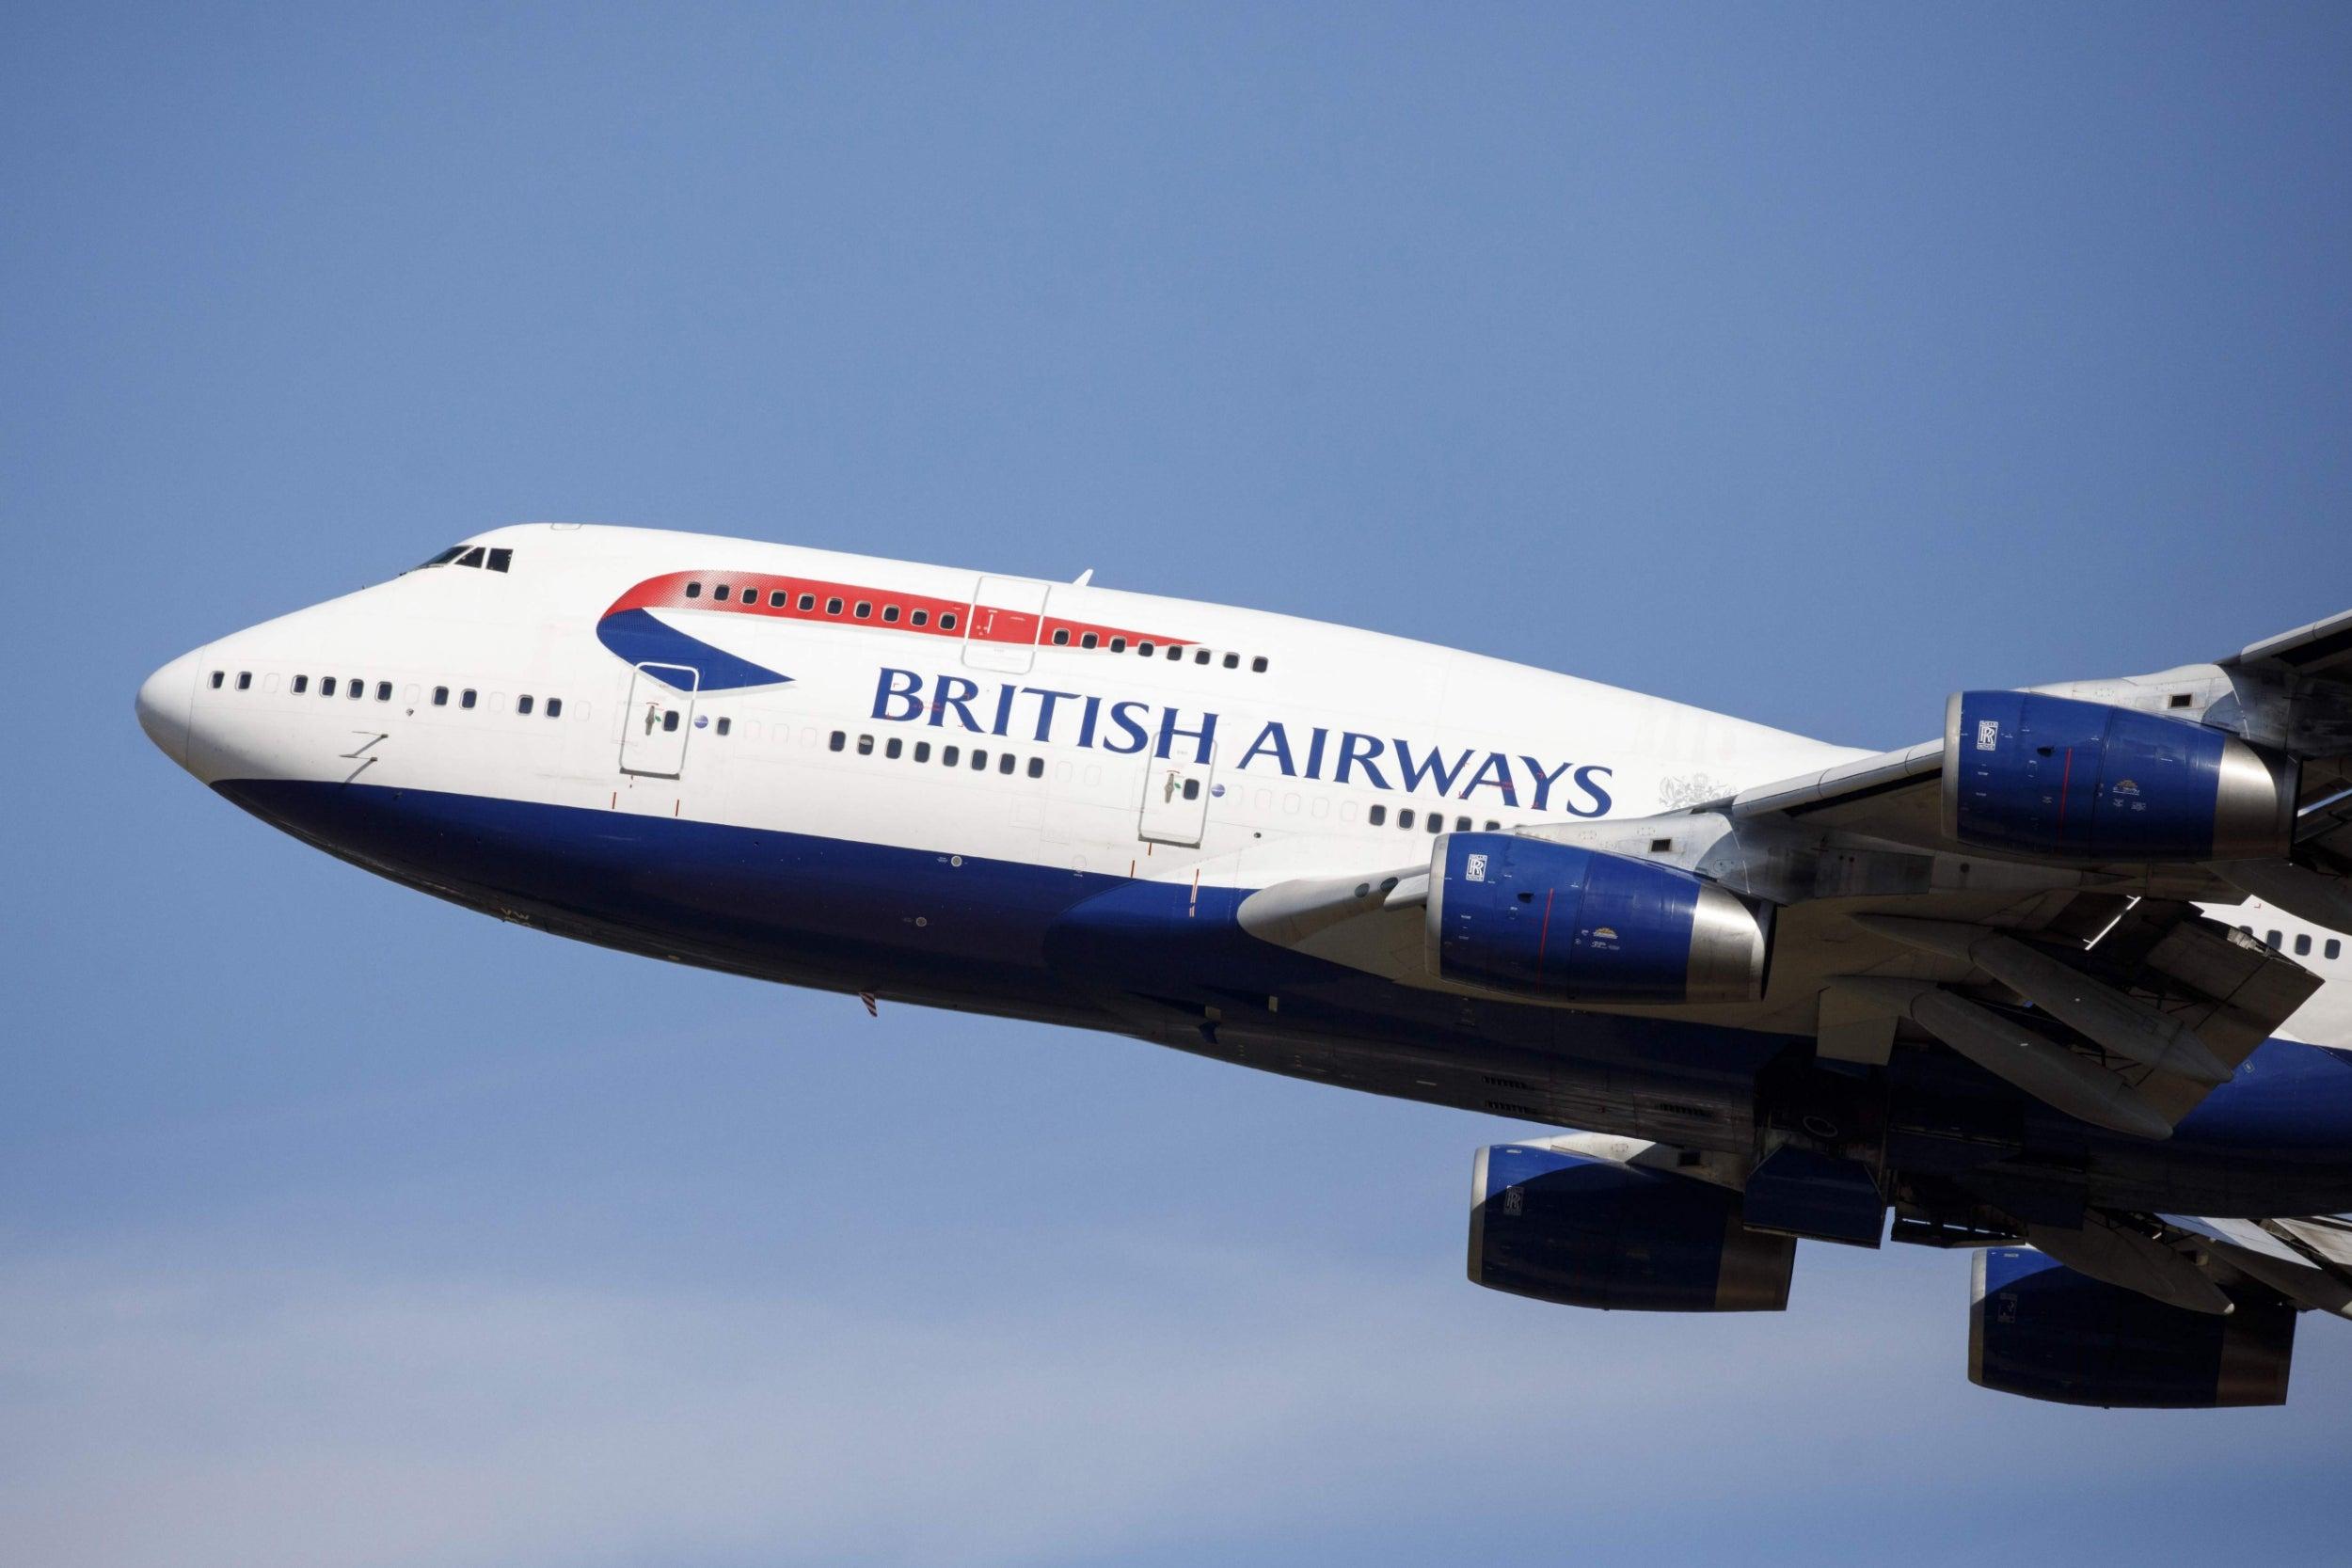 British Airways warns pilots of job losses as it continues to axe flights due to coronavirus